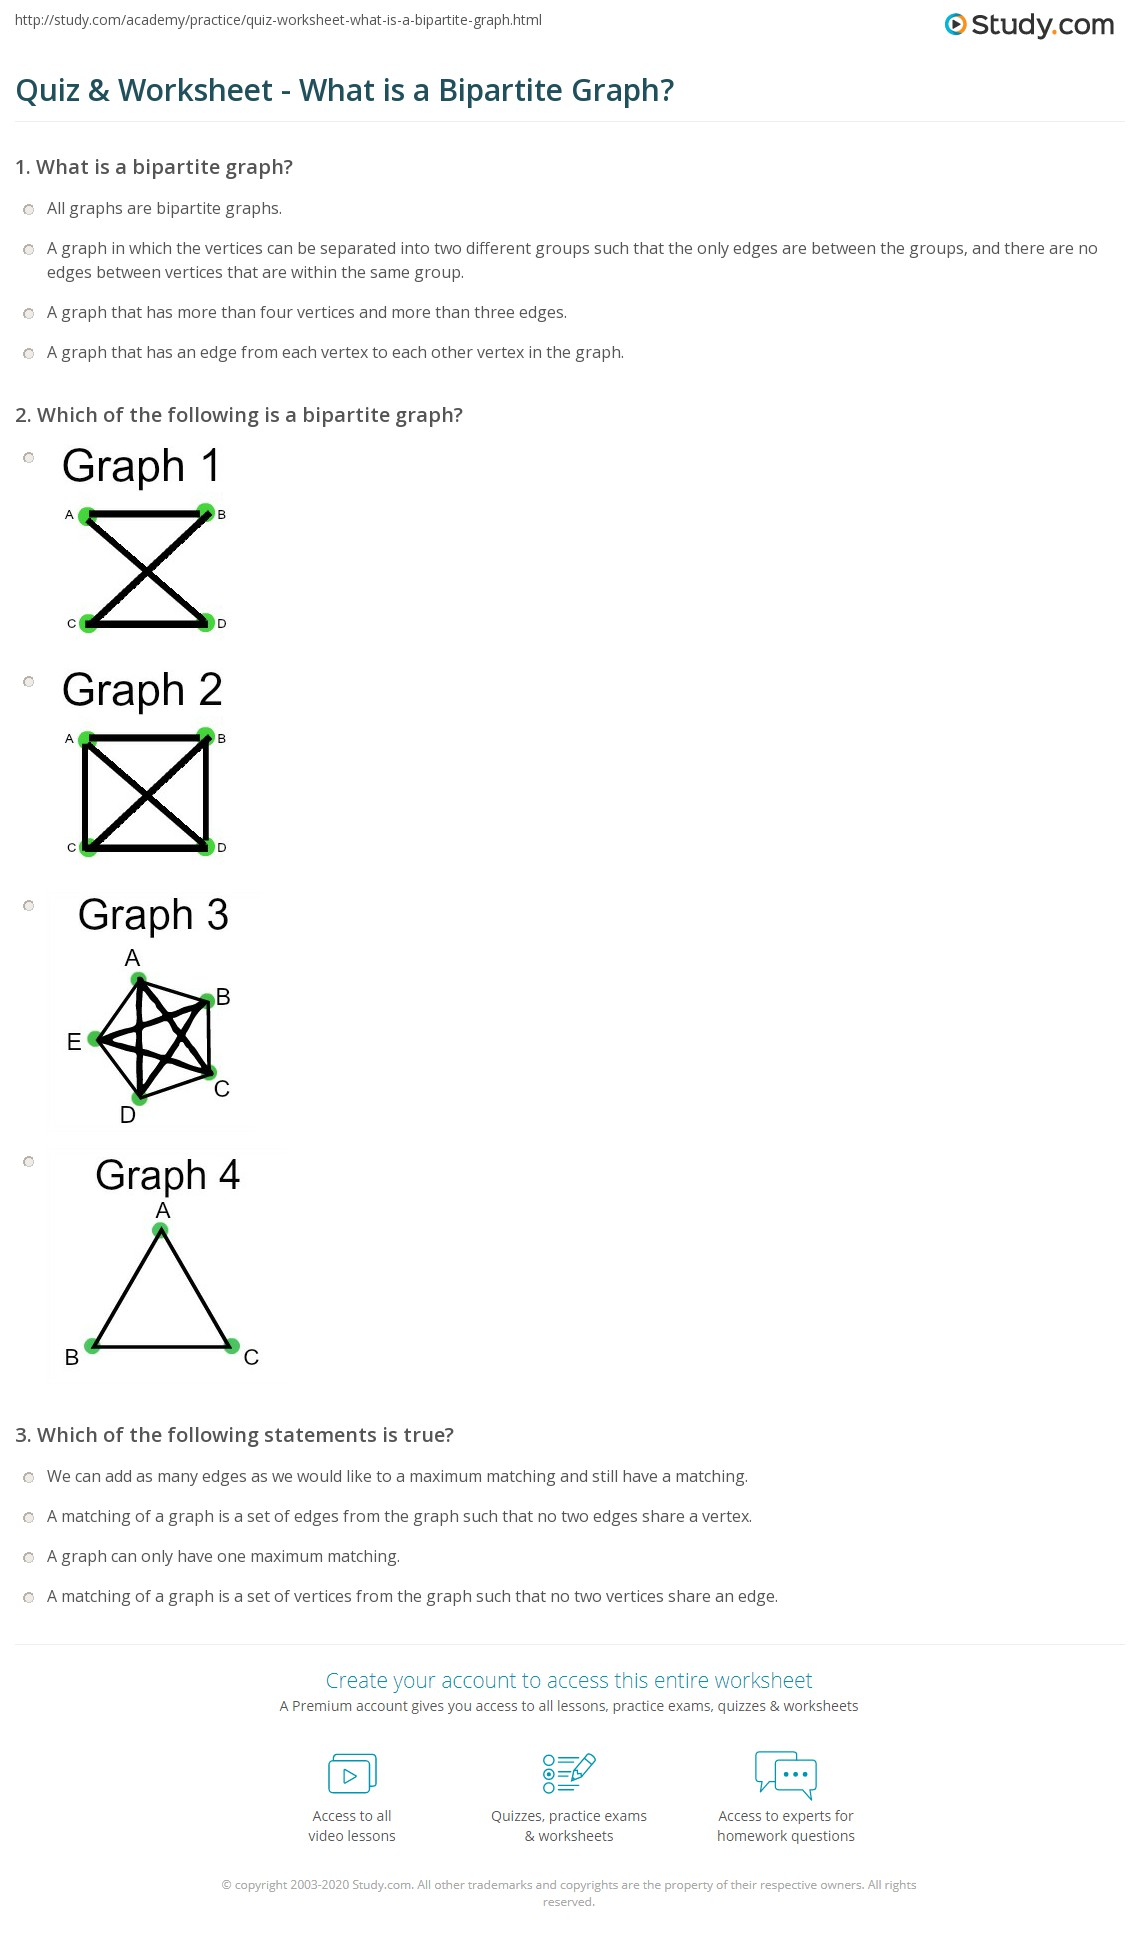 worksheet Vertex Edge Graph Worksheet quiz worksheet what is a bipartite graph study com print definition applications examples worksheet